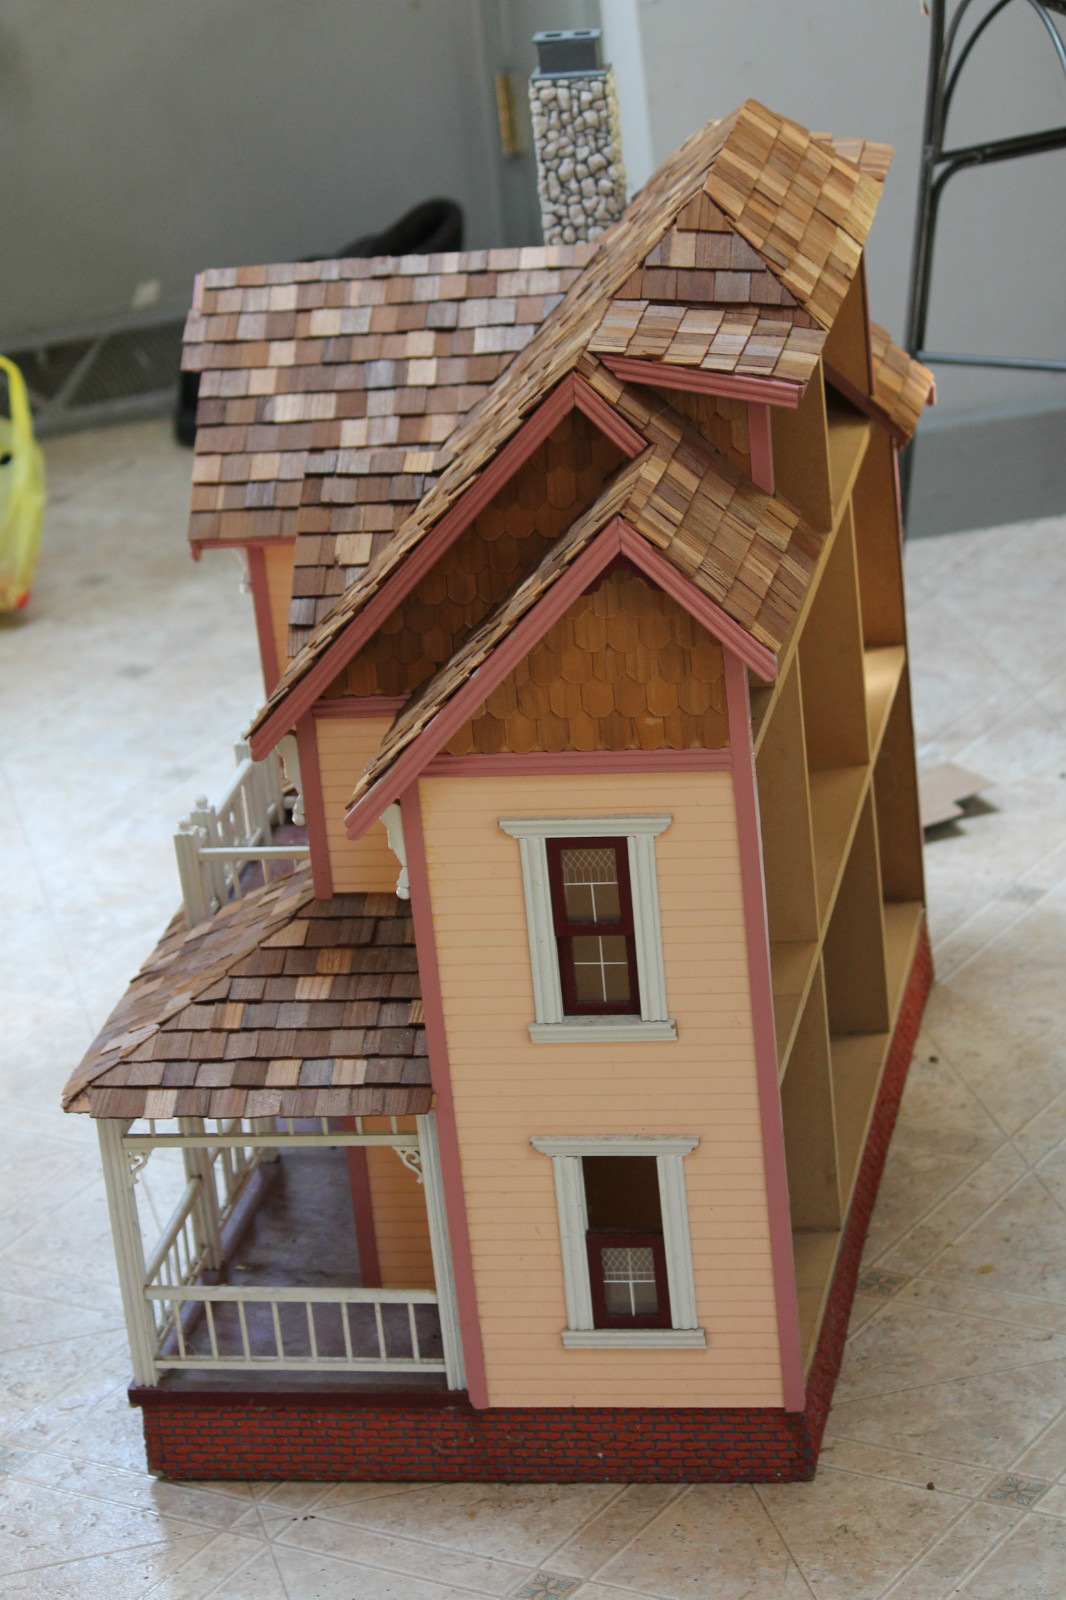 The Dollhouse Whisperer Dollhouse 20 The 2nd Duracraft